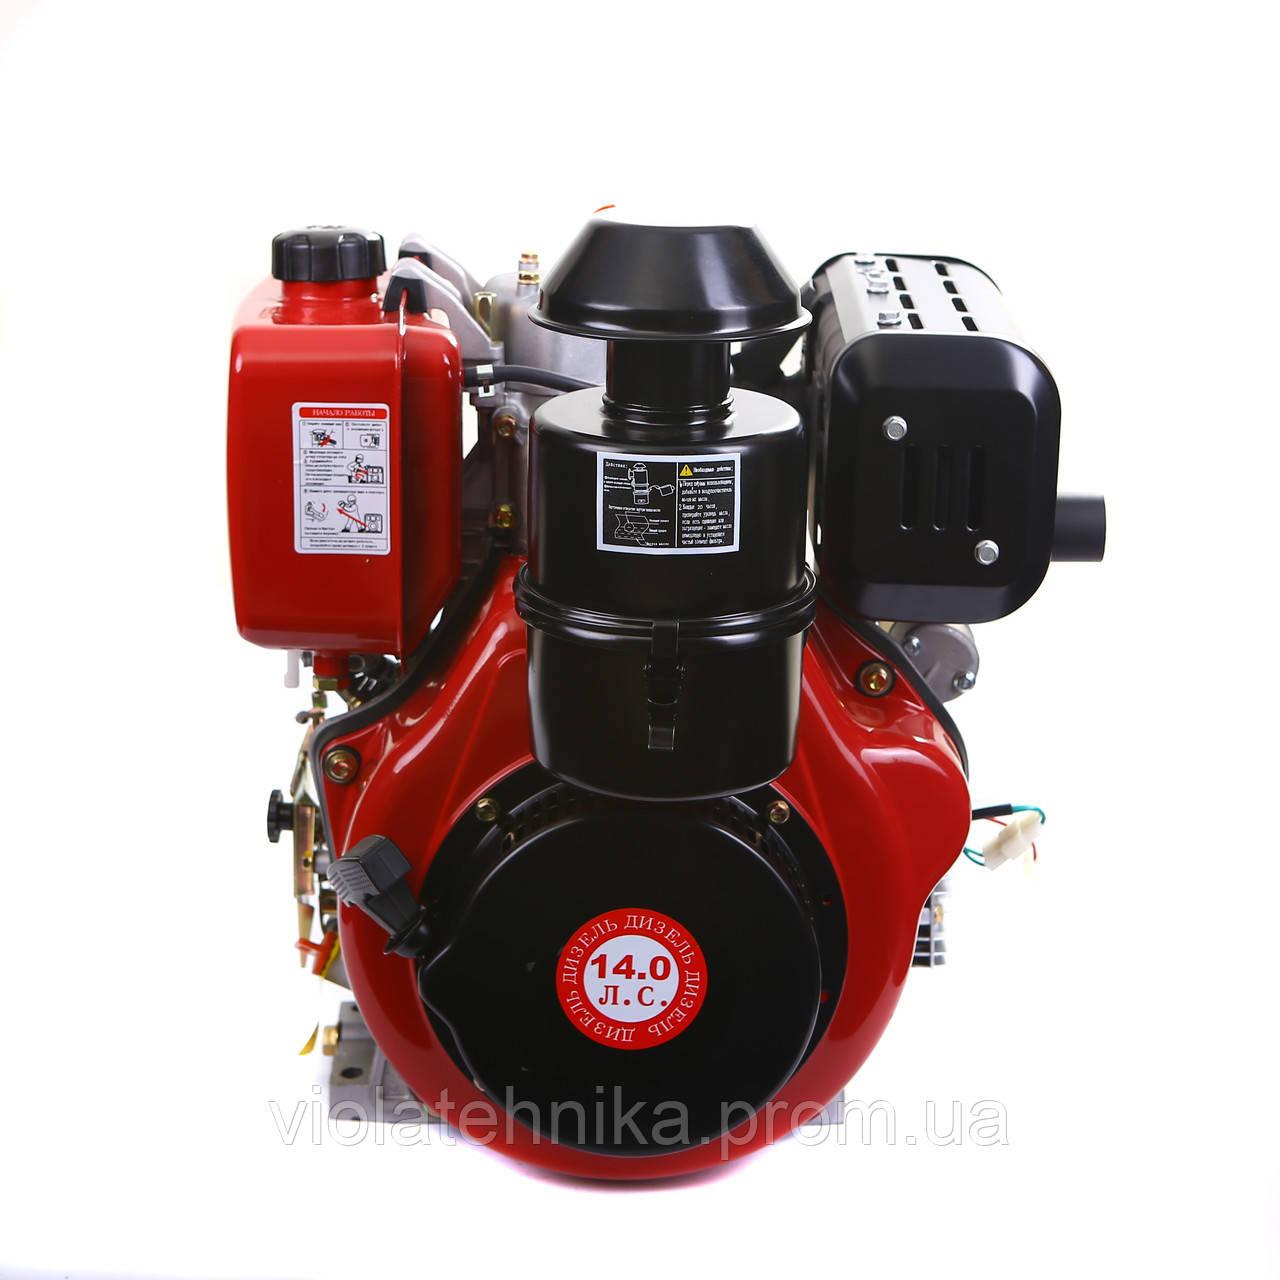 Двигун дизельний WEIMA WM192FЕ (вал під шпонку) 14 л. с.